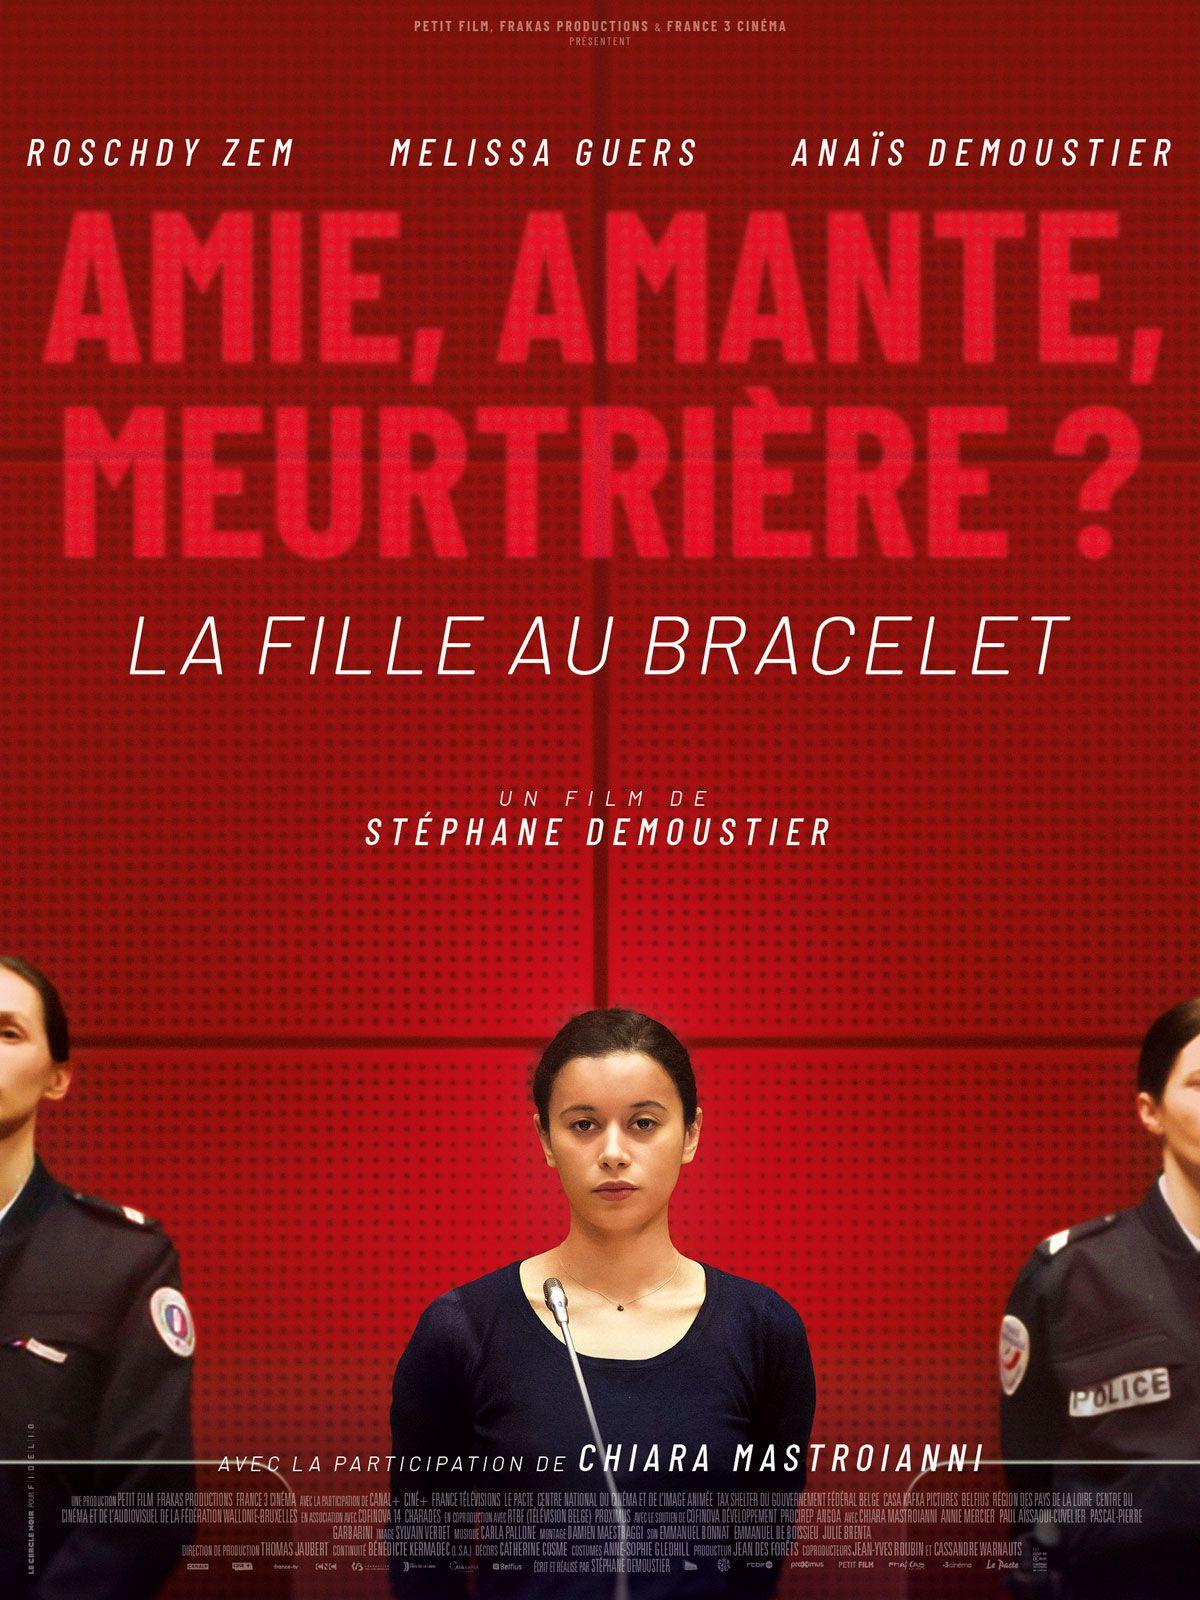 La Fille au bracelet - Film (2020)